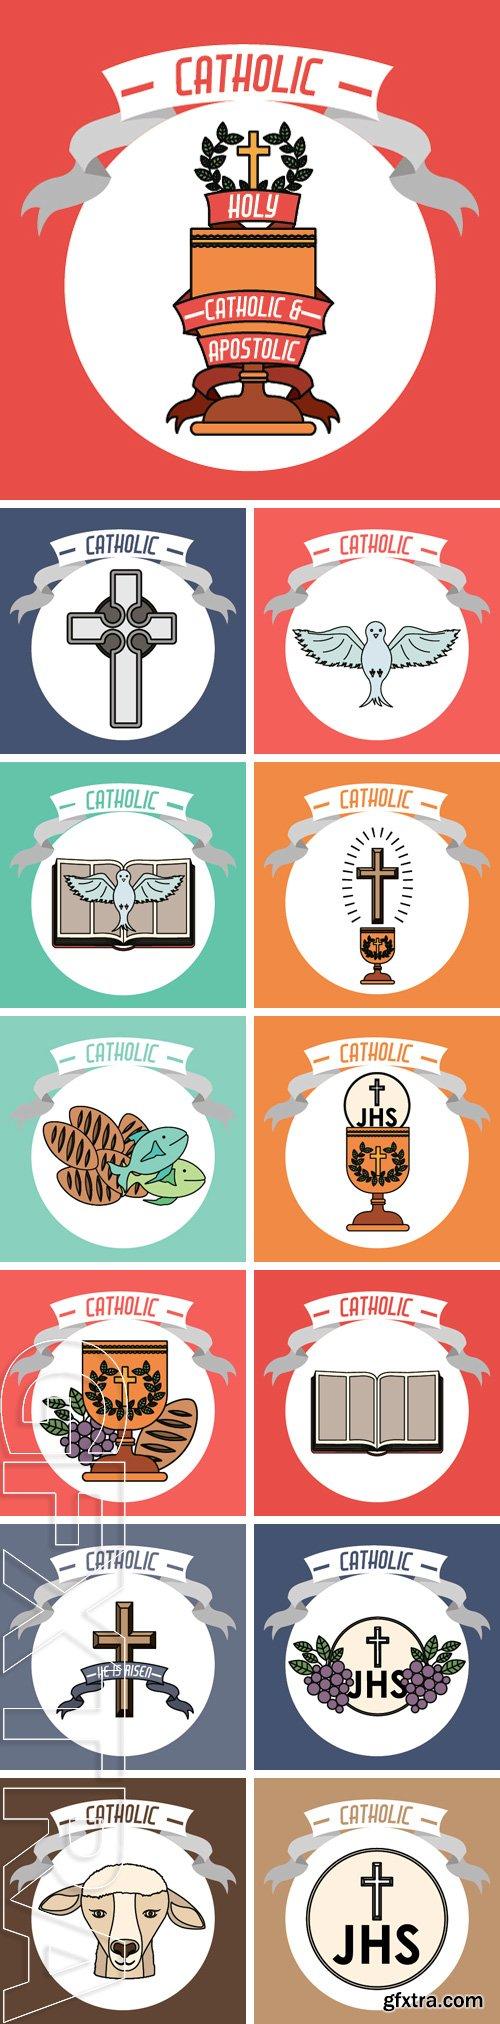 Stock Vectors - Catholic digital design, vector illustration